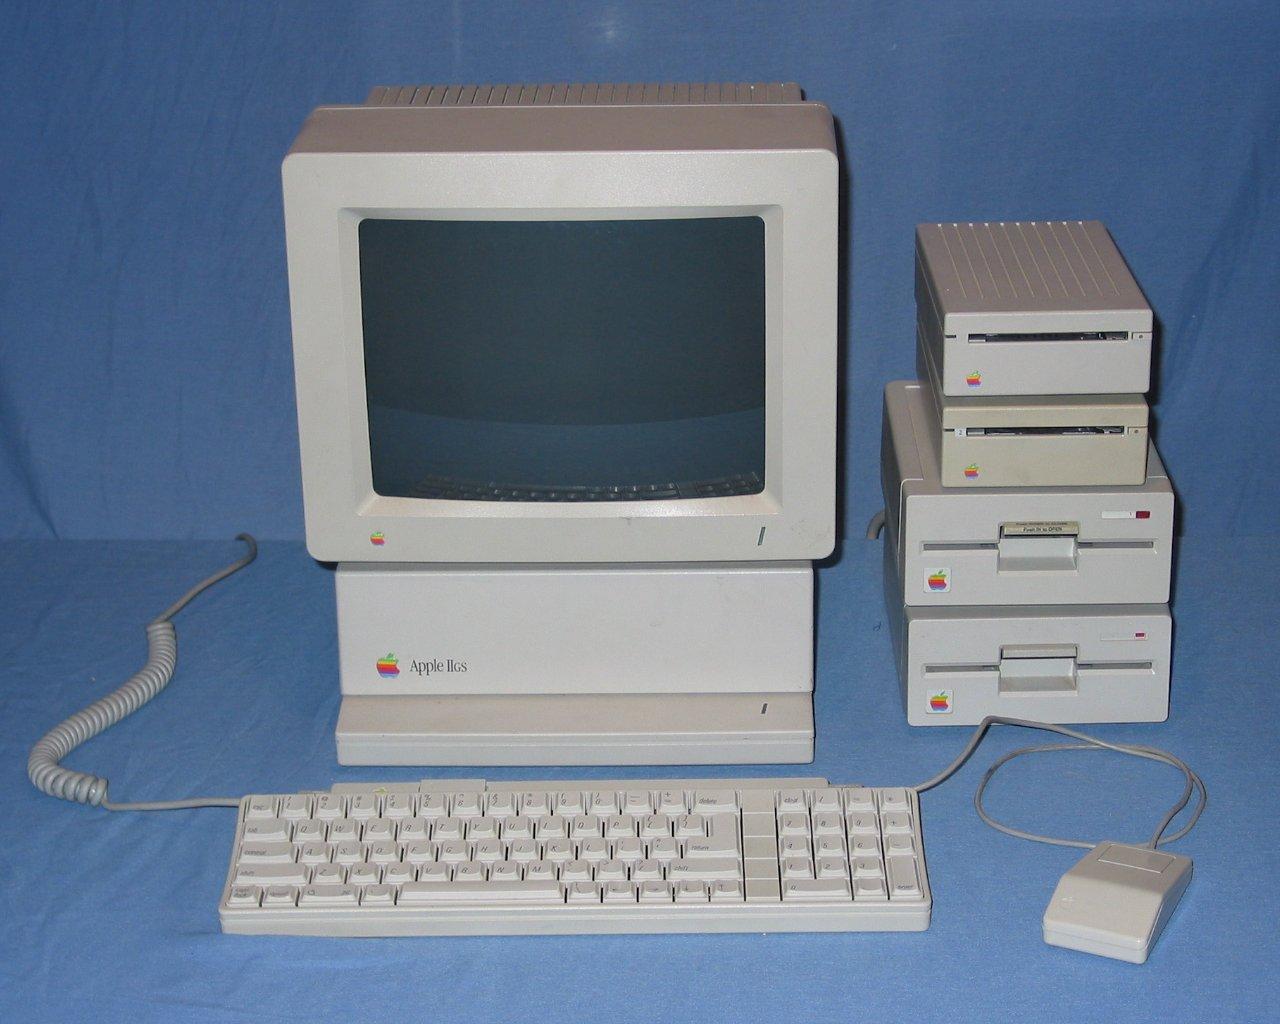 Apple Iigs Computers Popcorn Cx